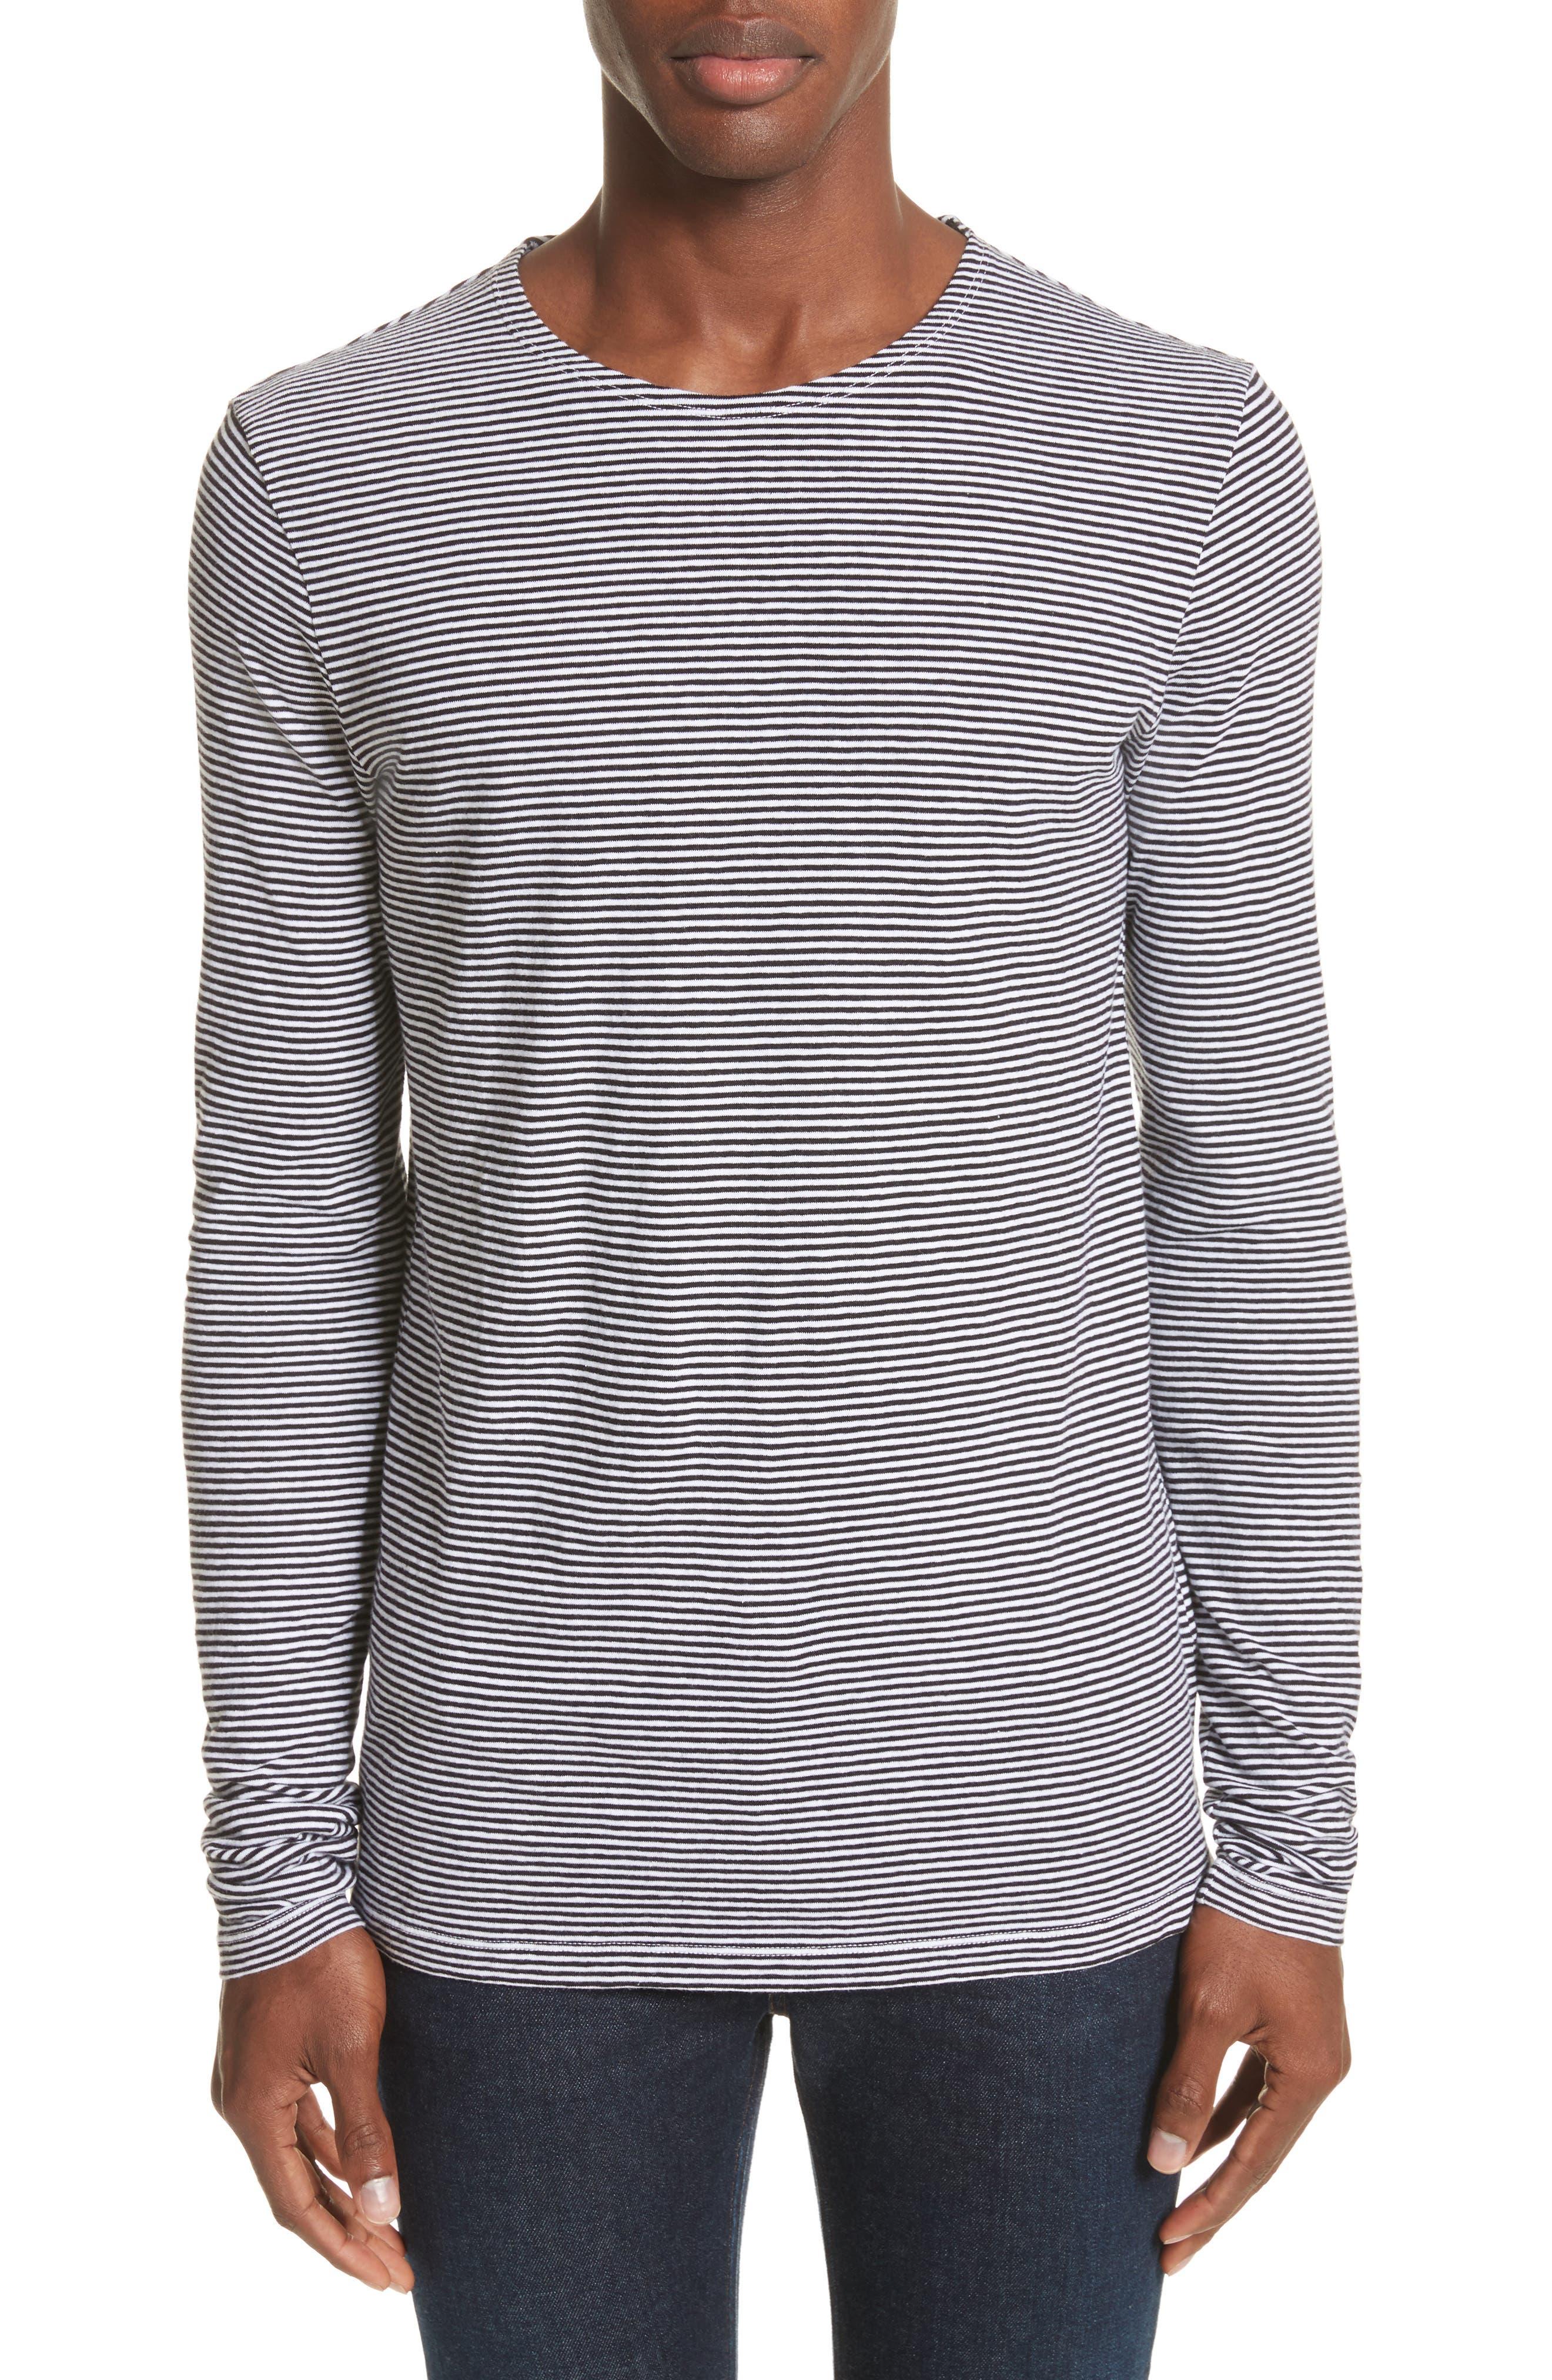 Tayford Stripe Long Sleeve T-Shirt,                         Main,                         color, White/ Black